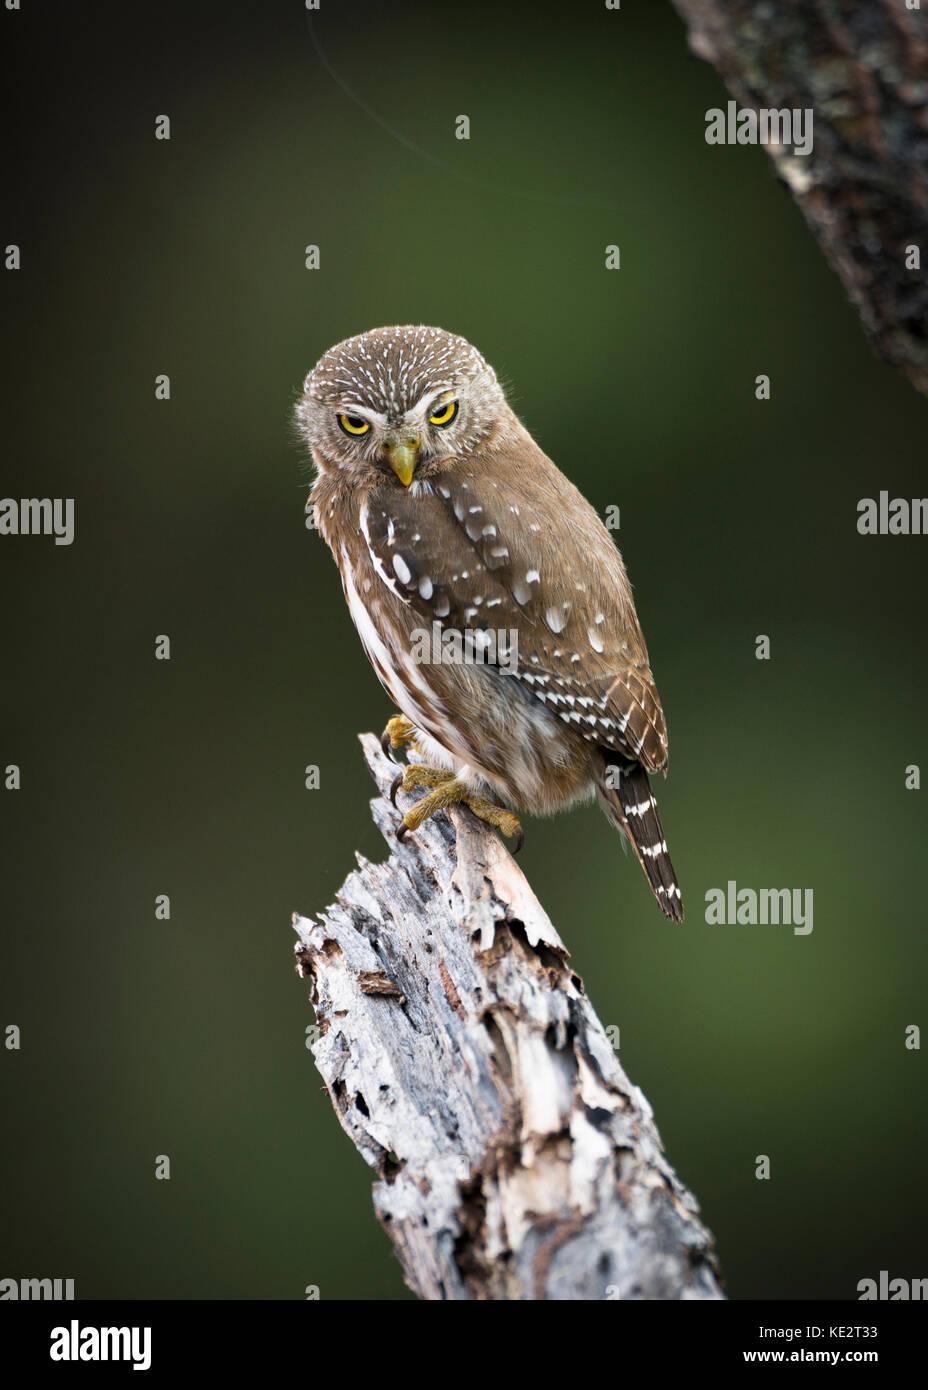 A Ferruginous Pymy-Owl (Glaucidium brasilianum) from central Brazil - Stock Image